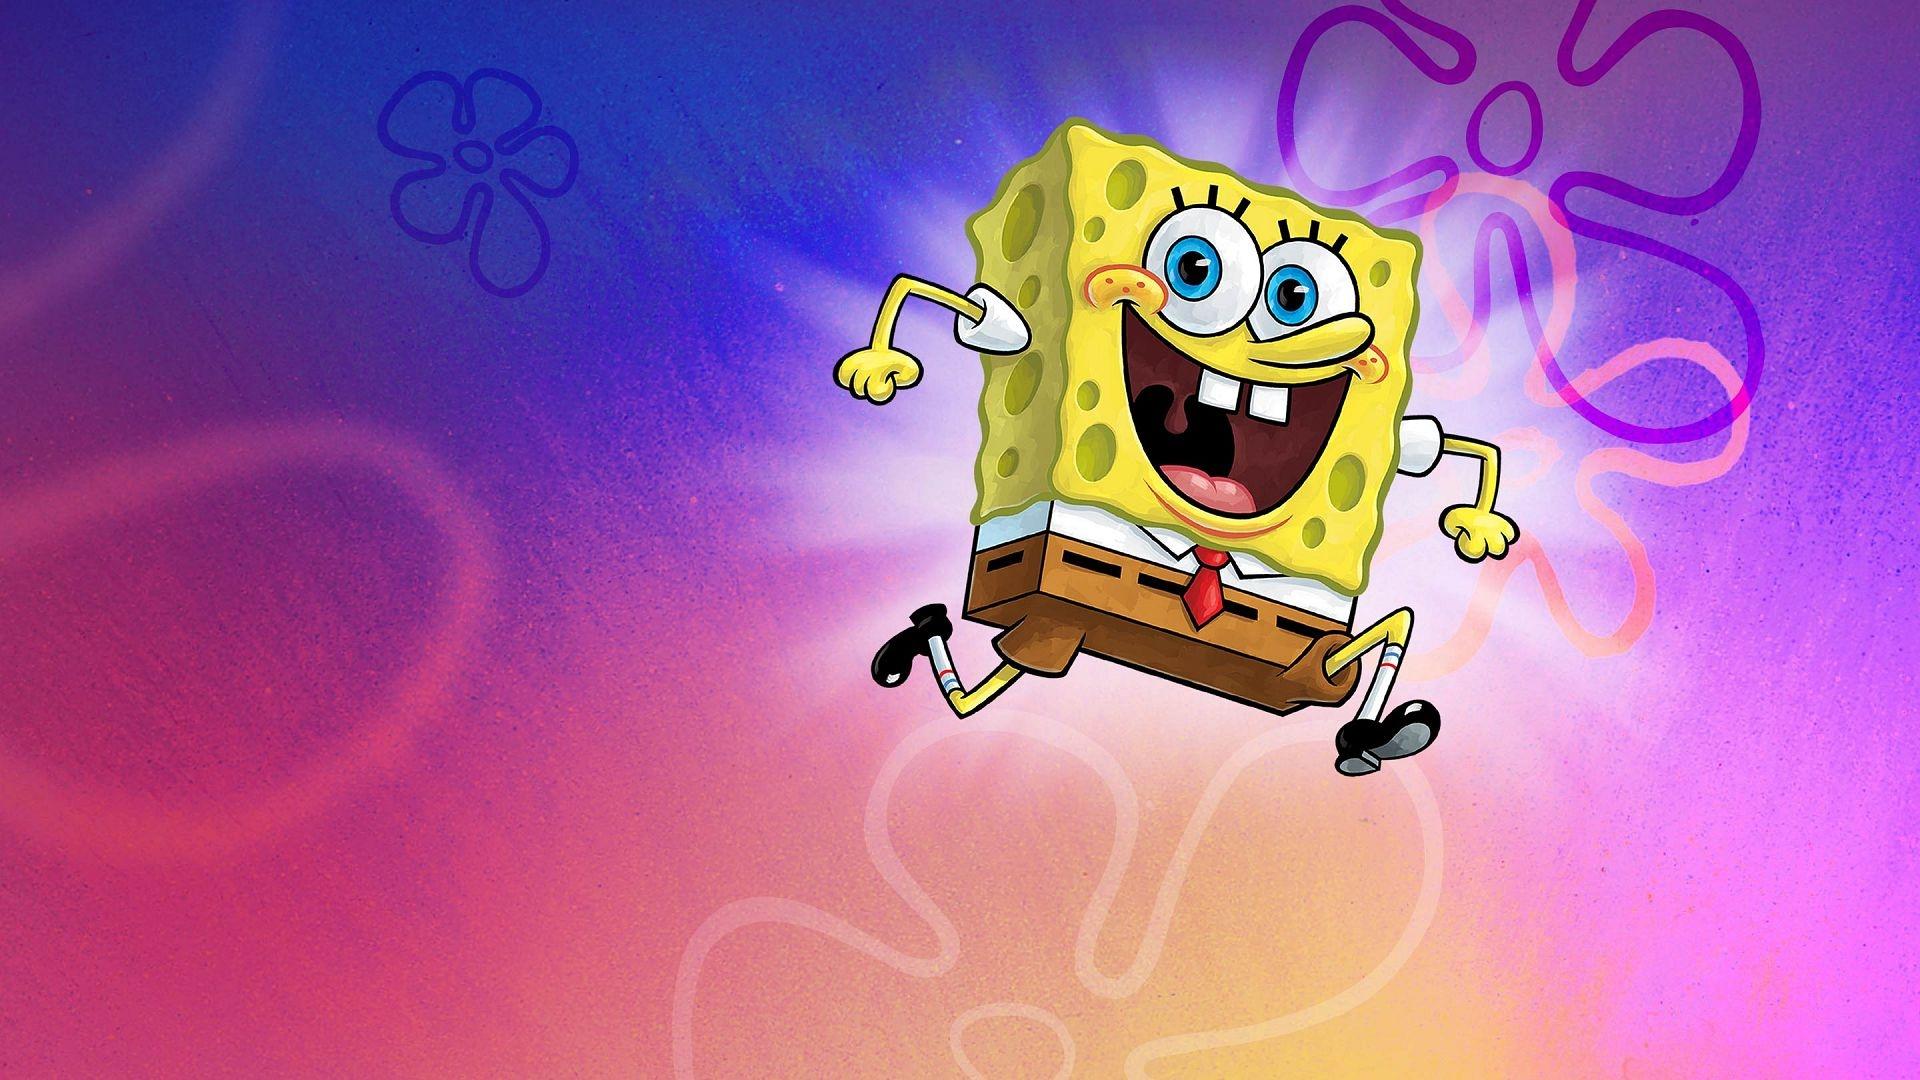 Sponge background picture